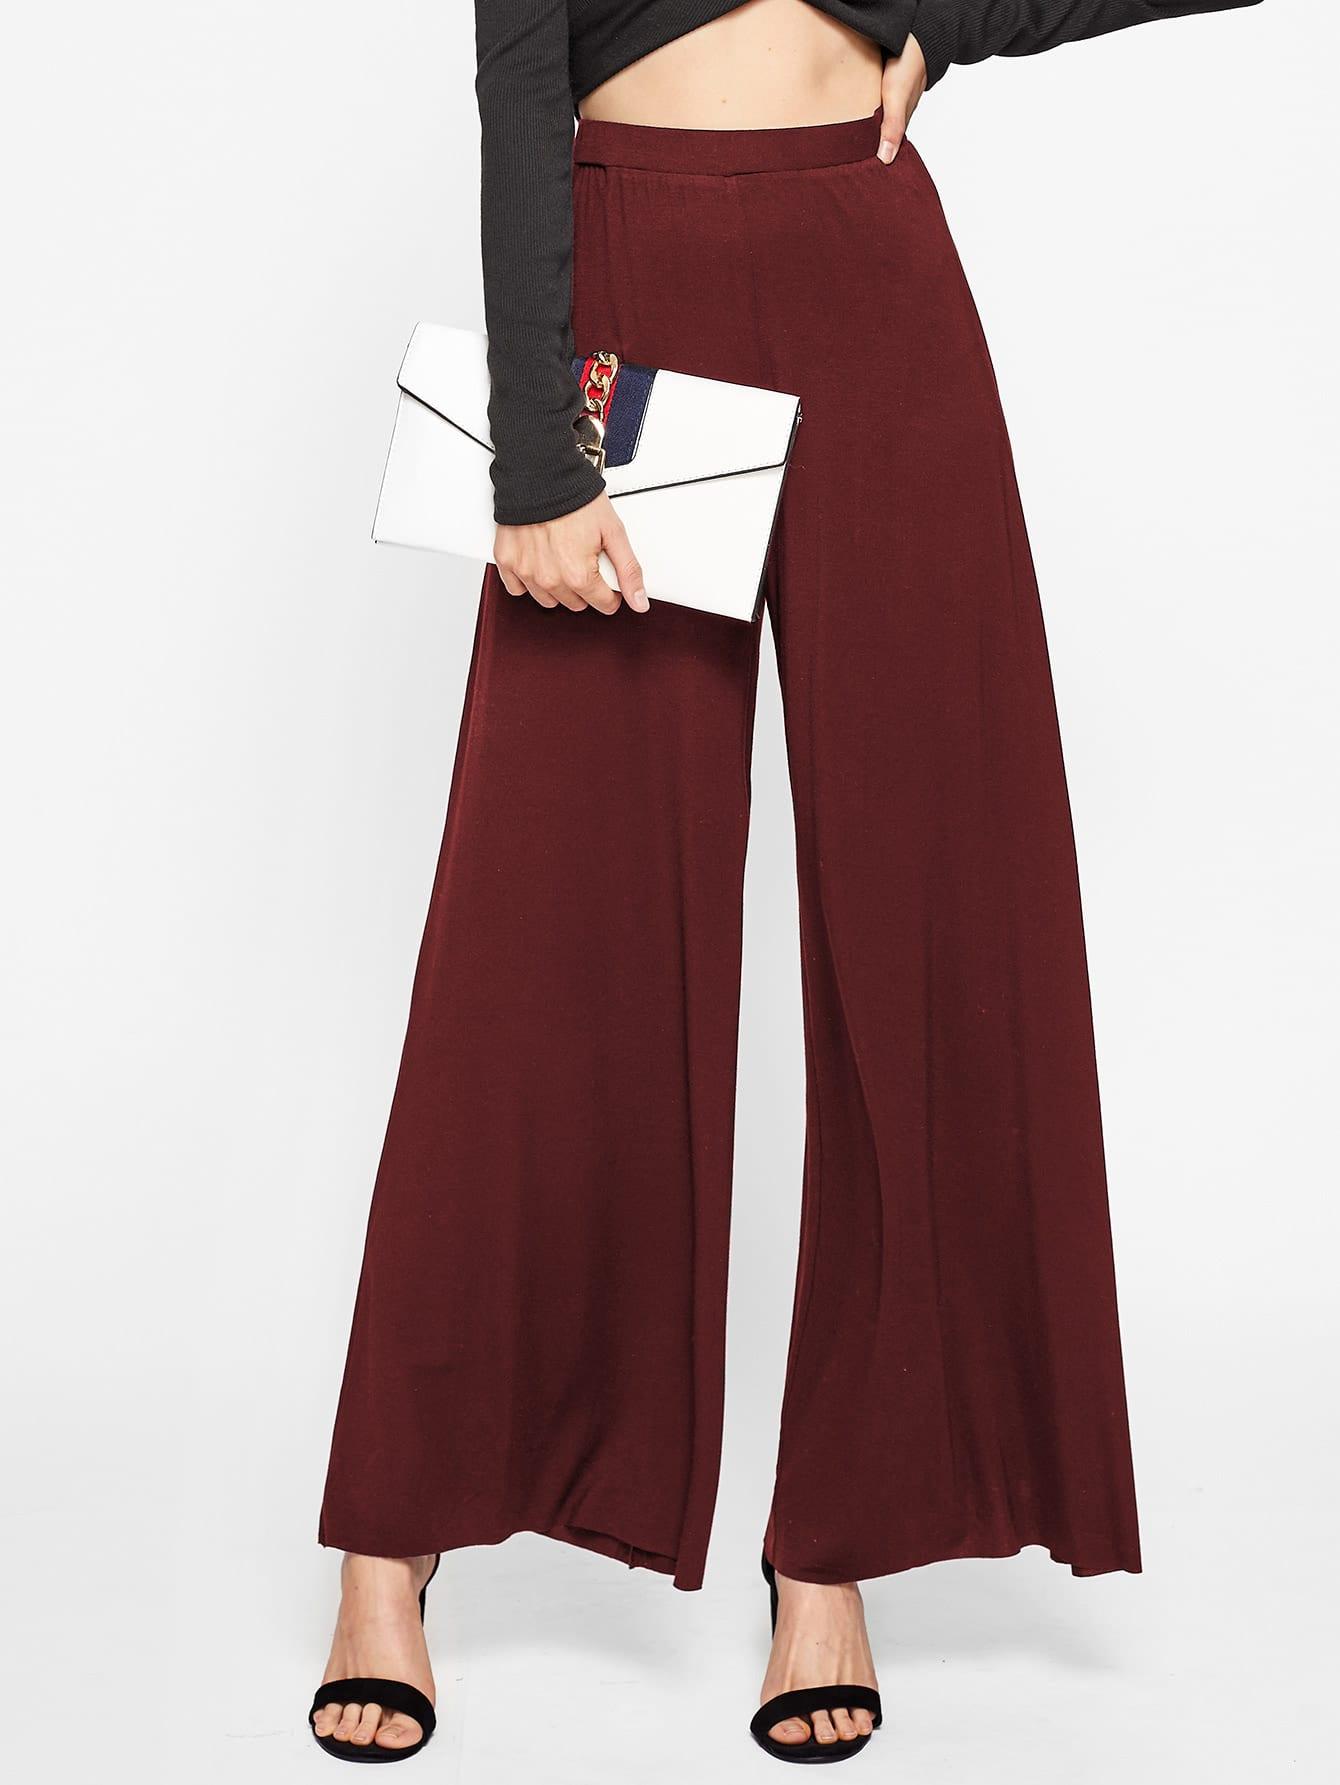 Elasticized Waist Super Wide Leg Pants elasticized waist velvet pants